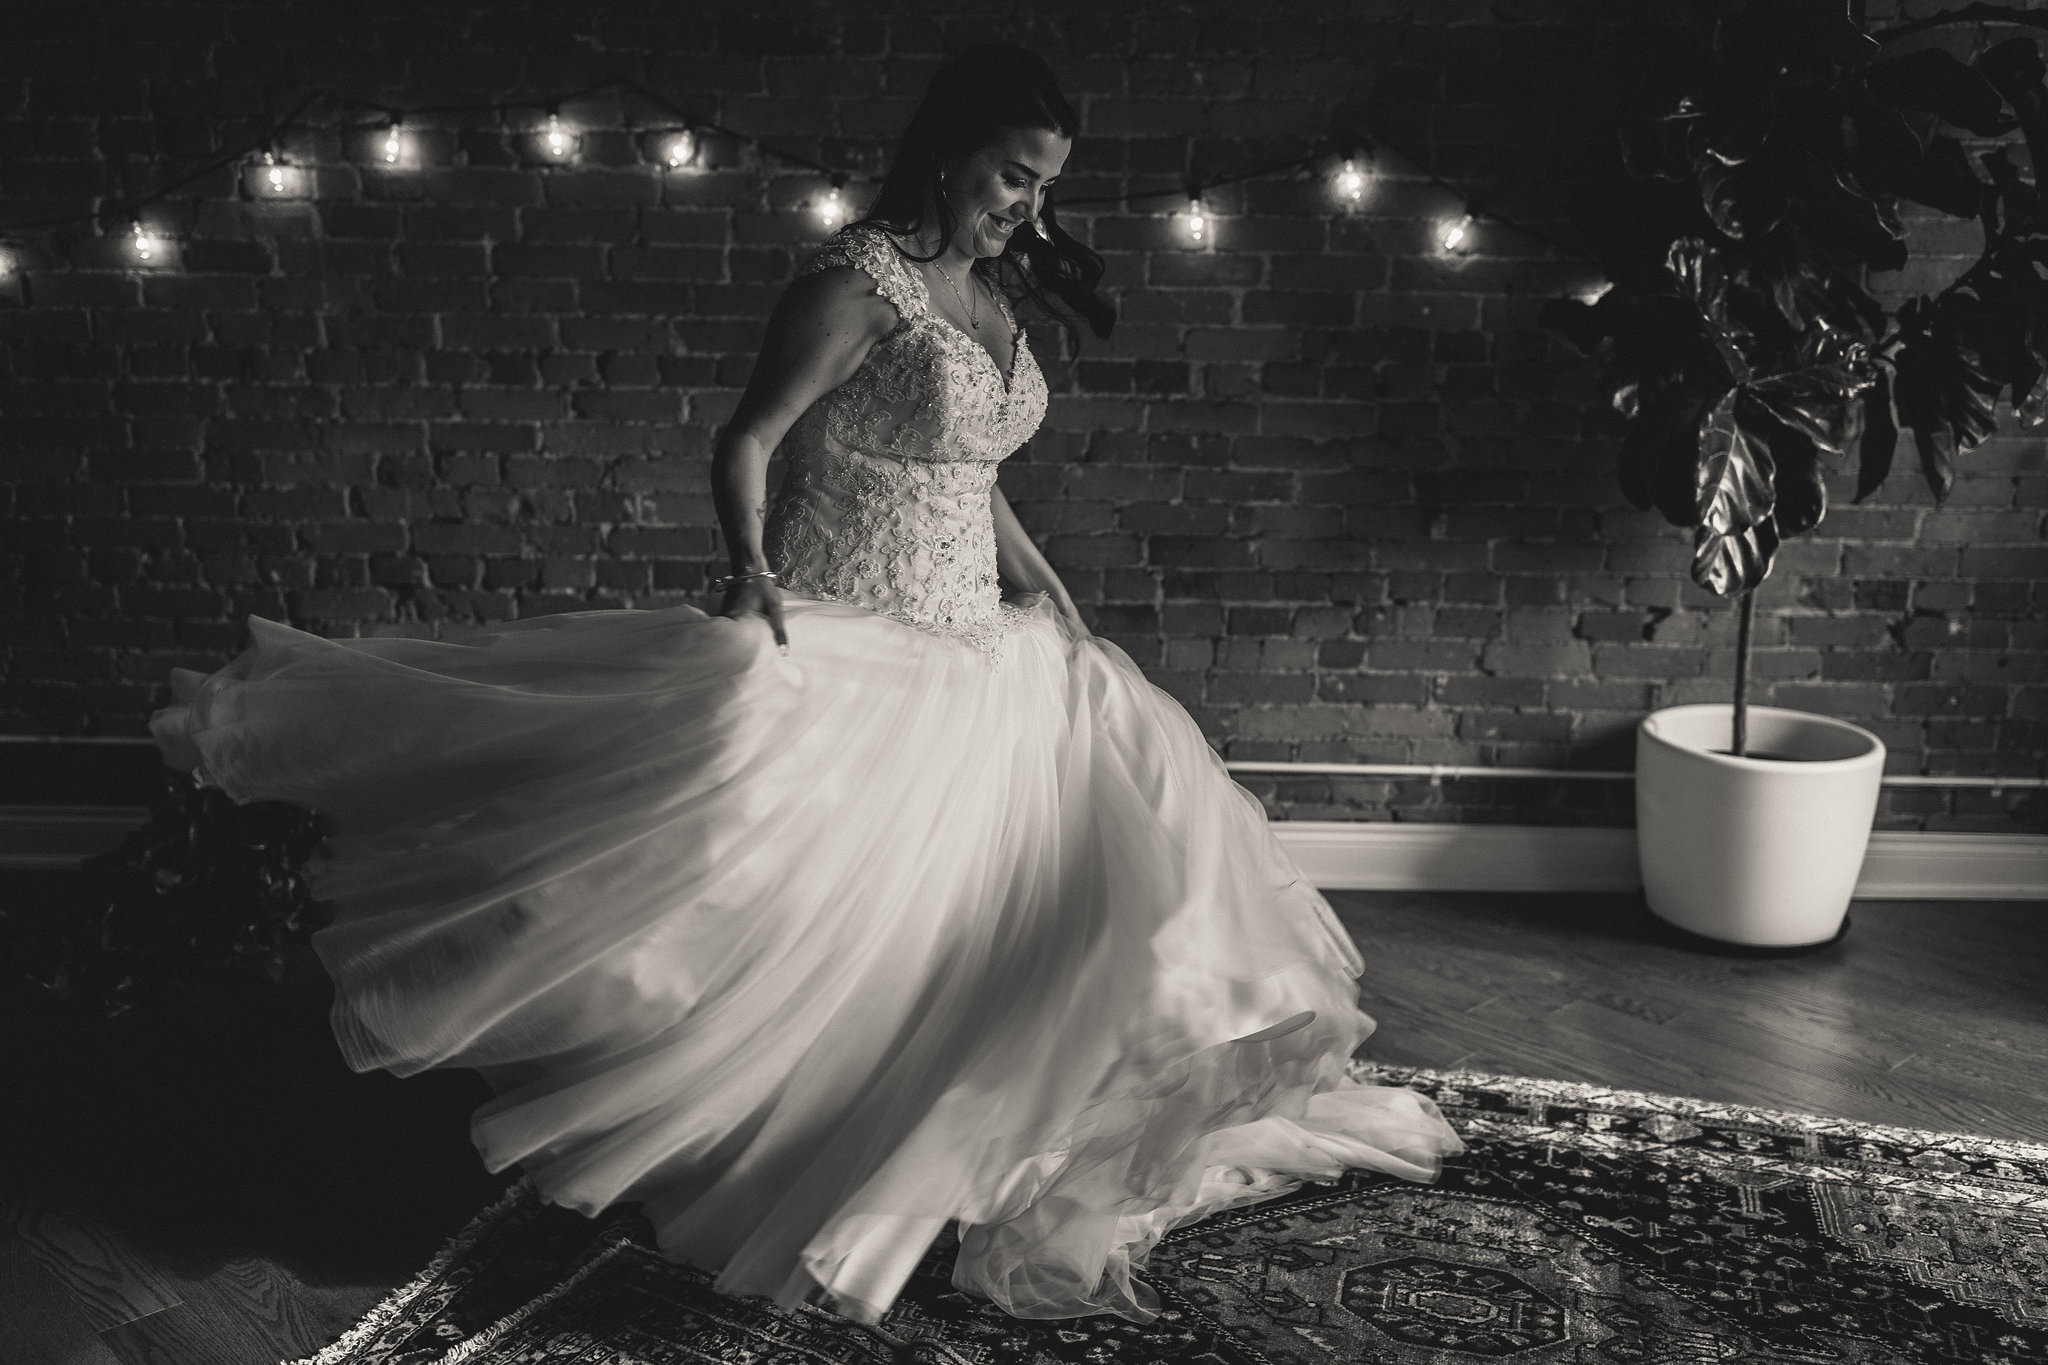 Kristen Adam Kindred Loft Whitby Wedding Photos 350 - Durham Wedding Photographer: Kindred Loft Wedding Photos